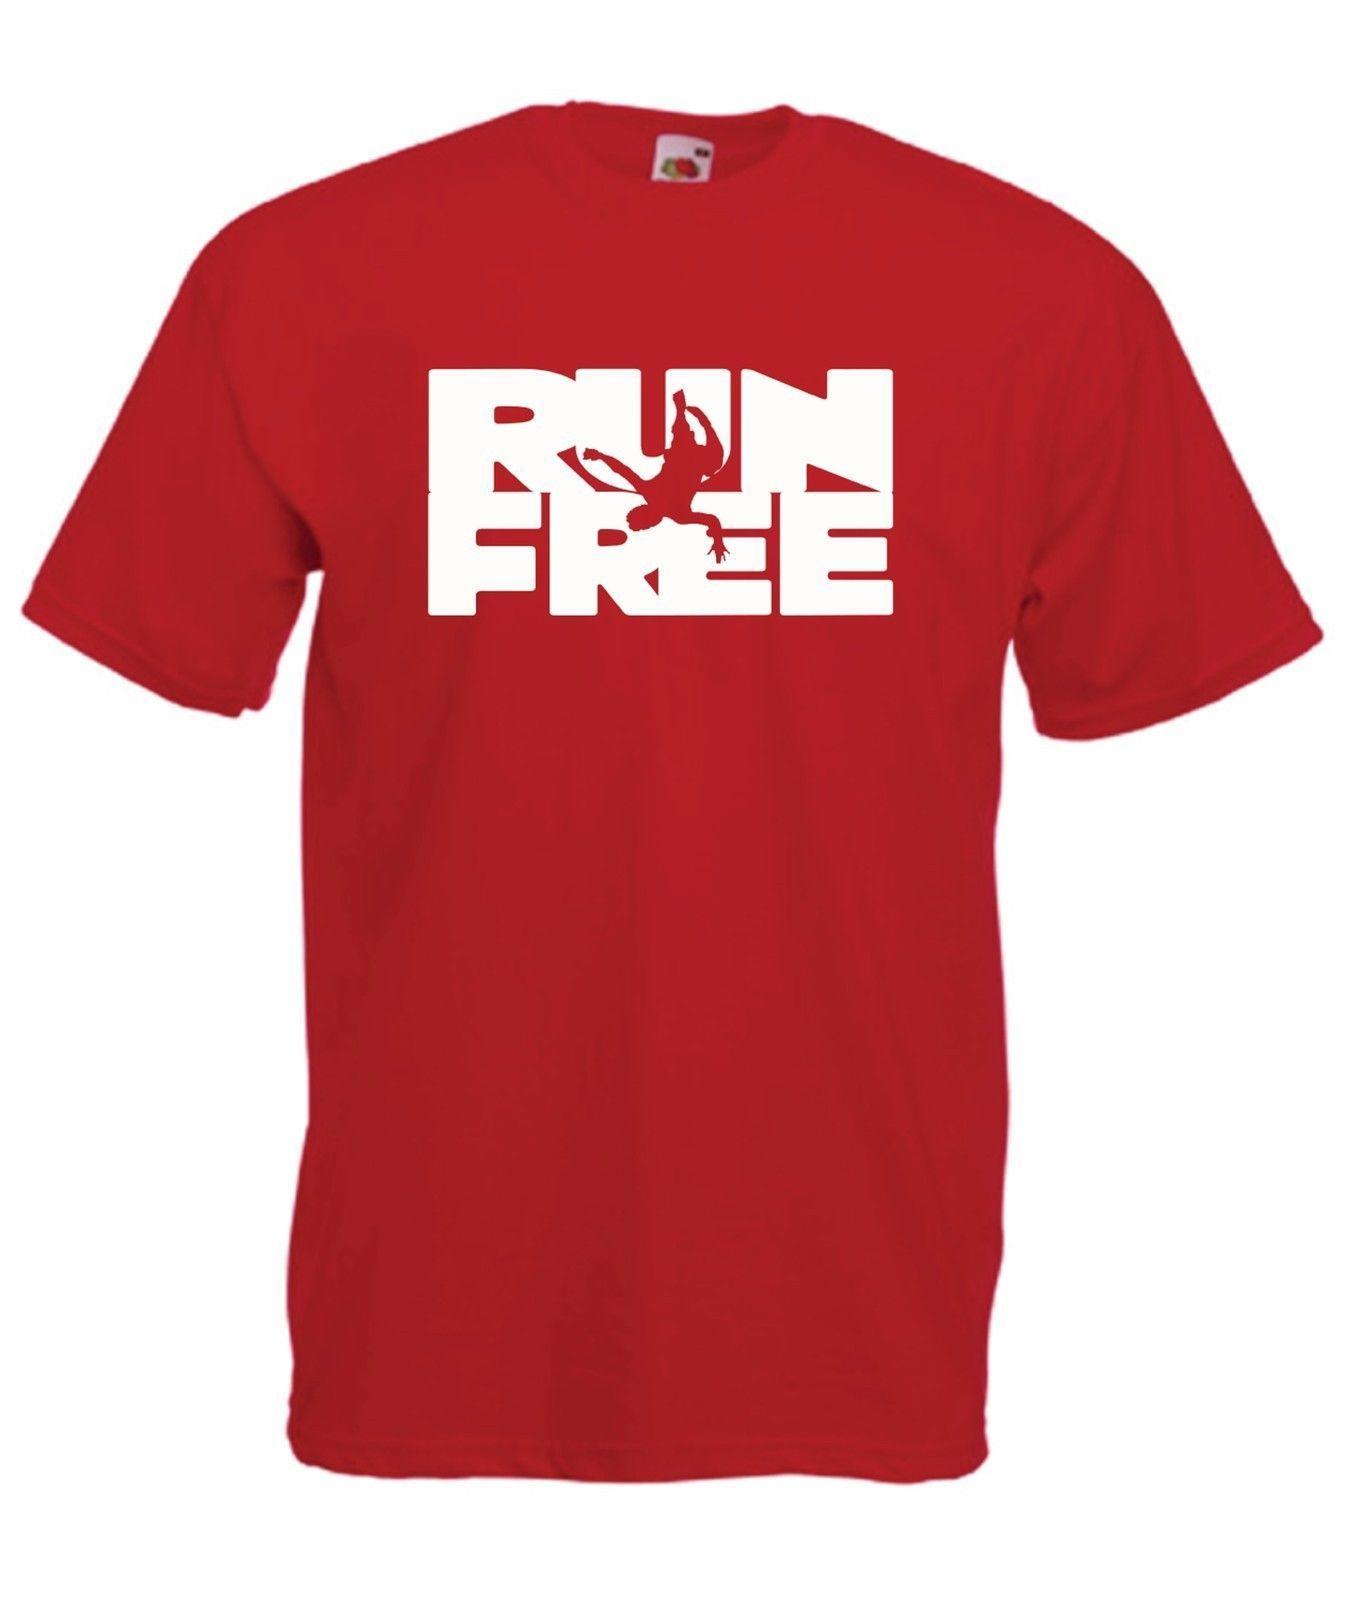 PARKOUR RUN FREE Free Running Jumping Climbing Xmas Birthday Mens Womens T SHIRT Funny Casual Tee Shirt Shart From Fatcuckoo 1296